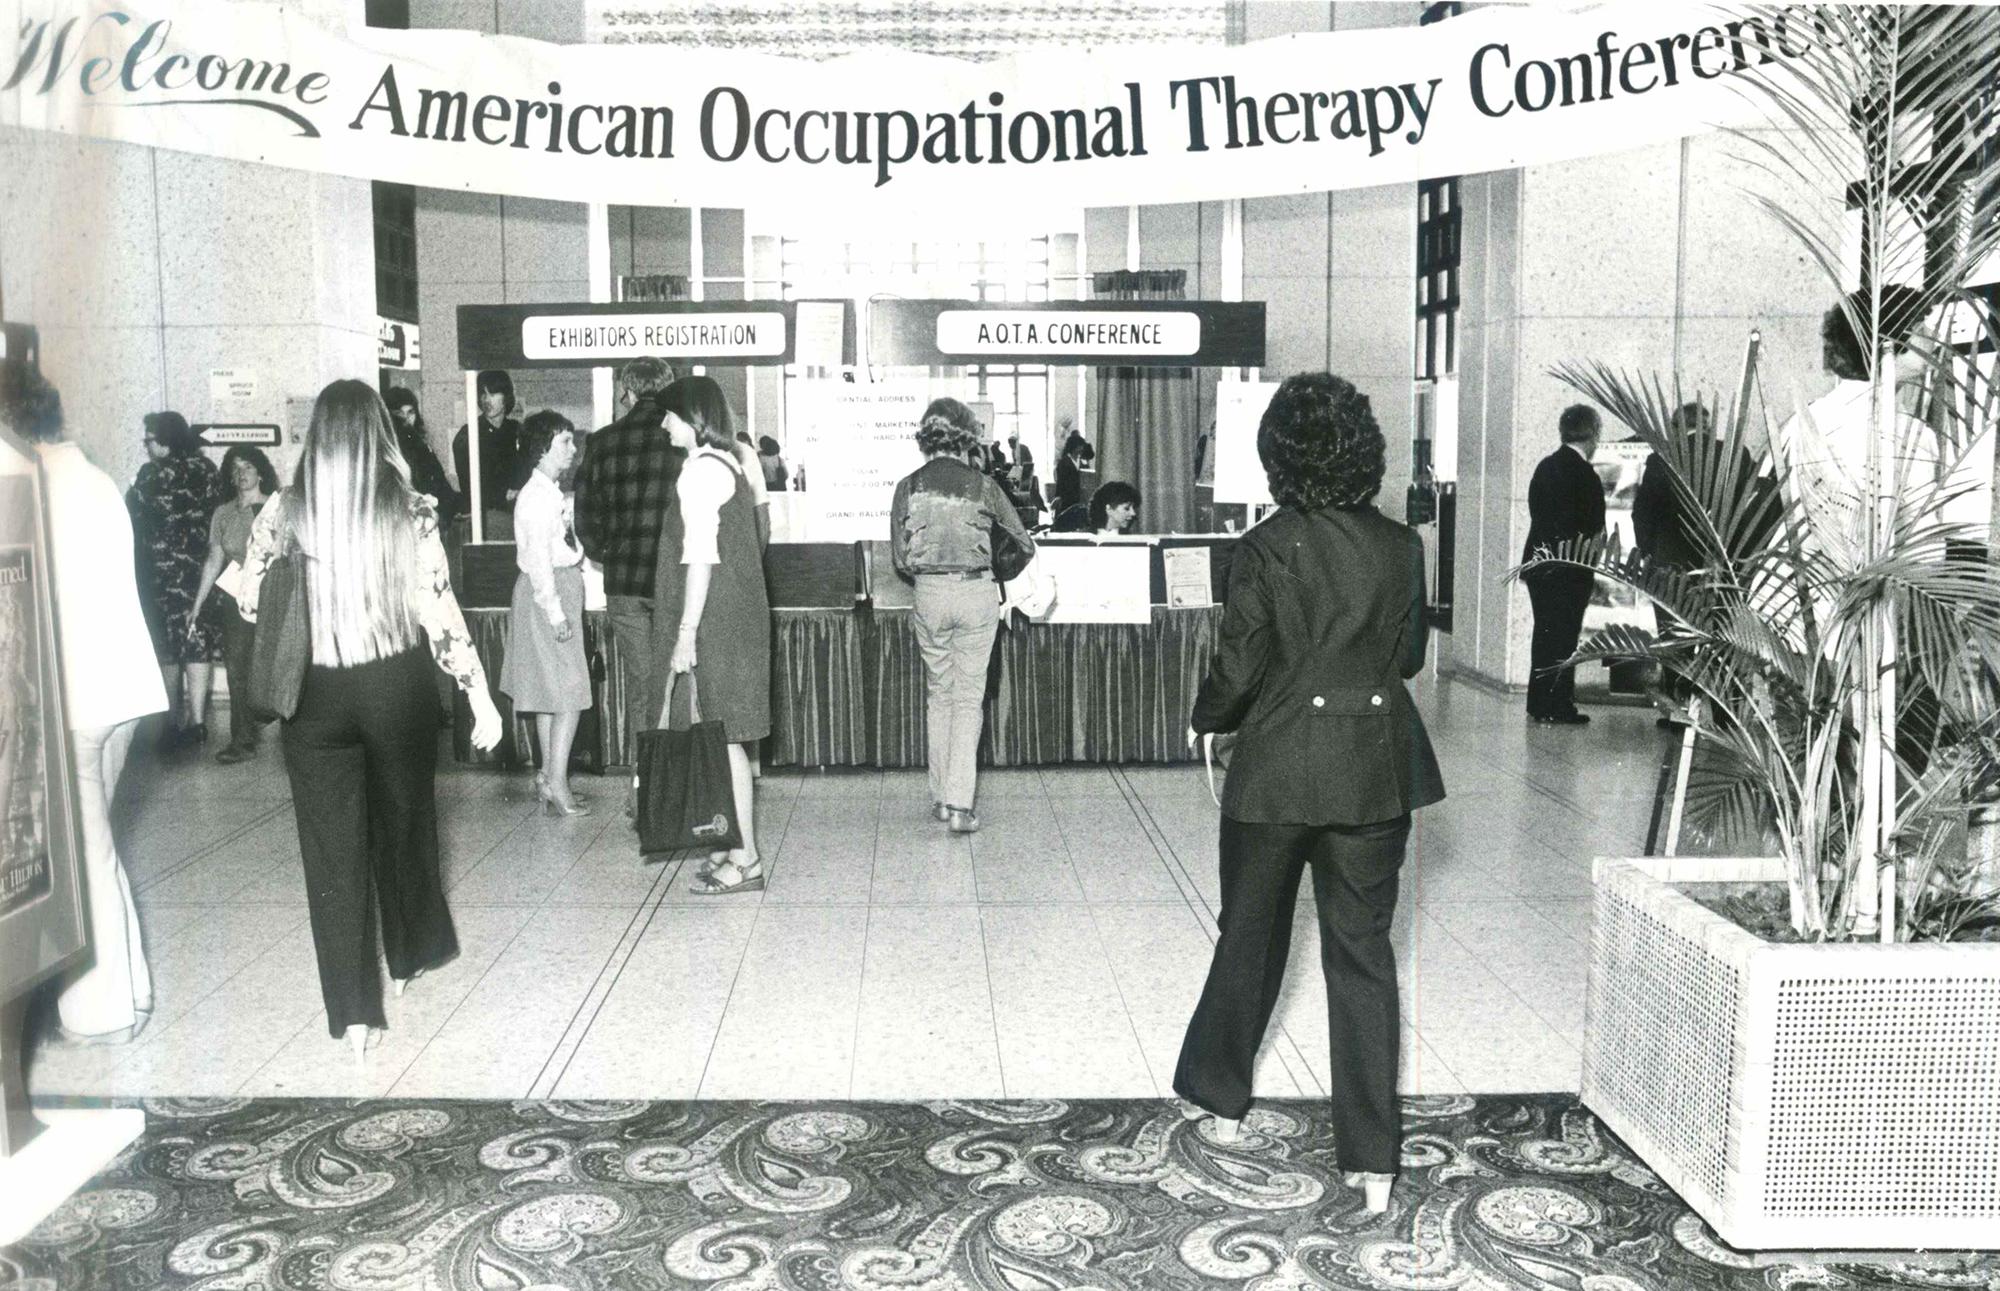 Registration area in 1980.